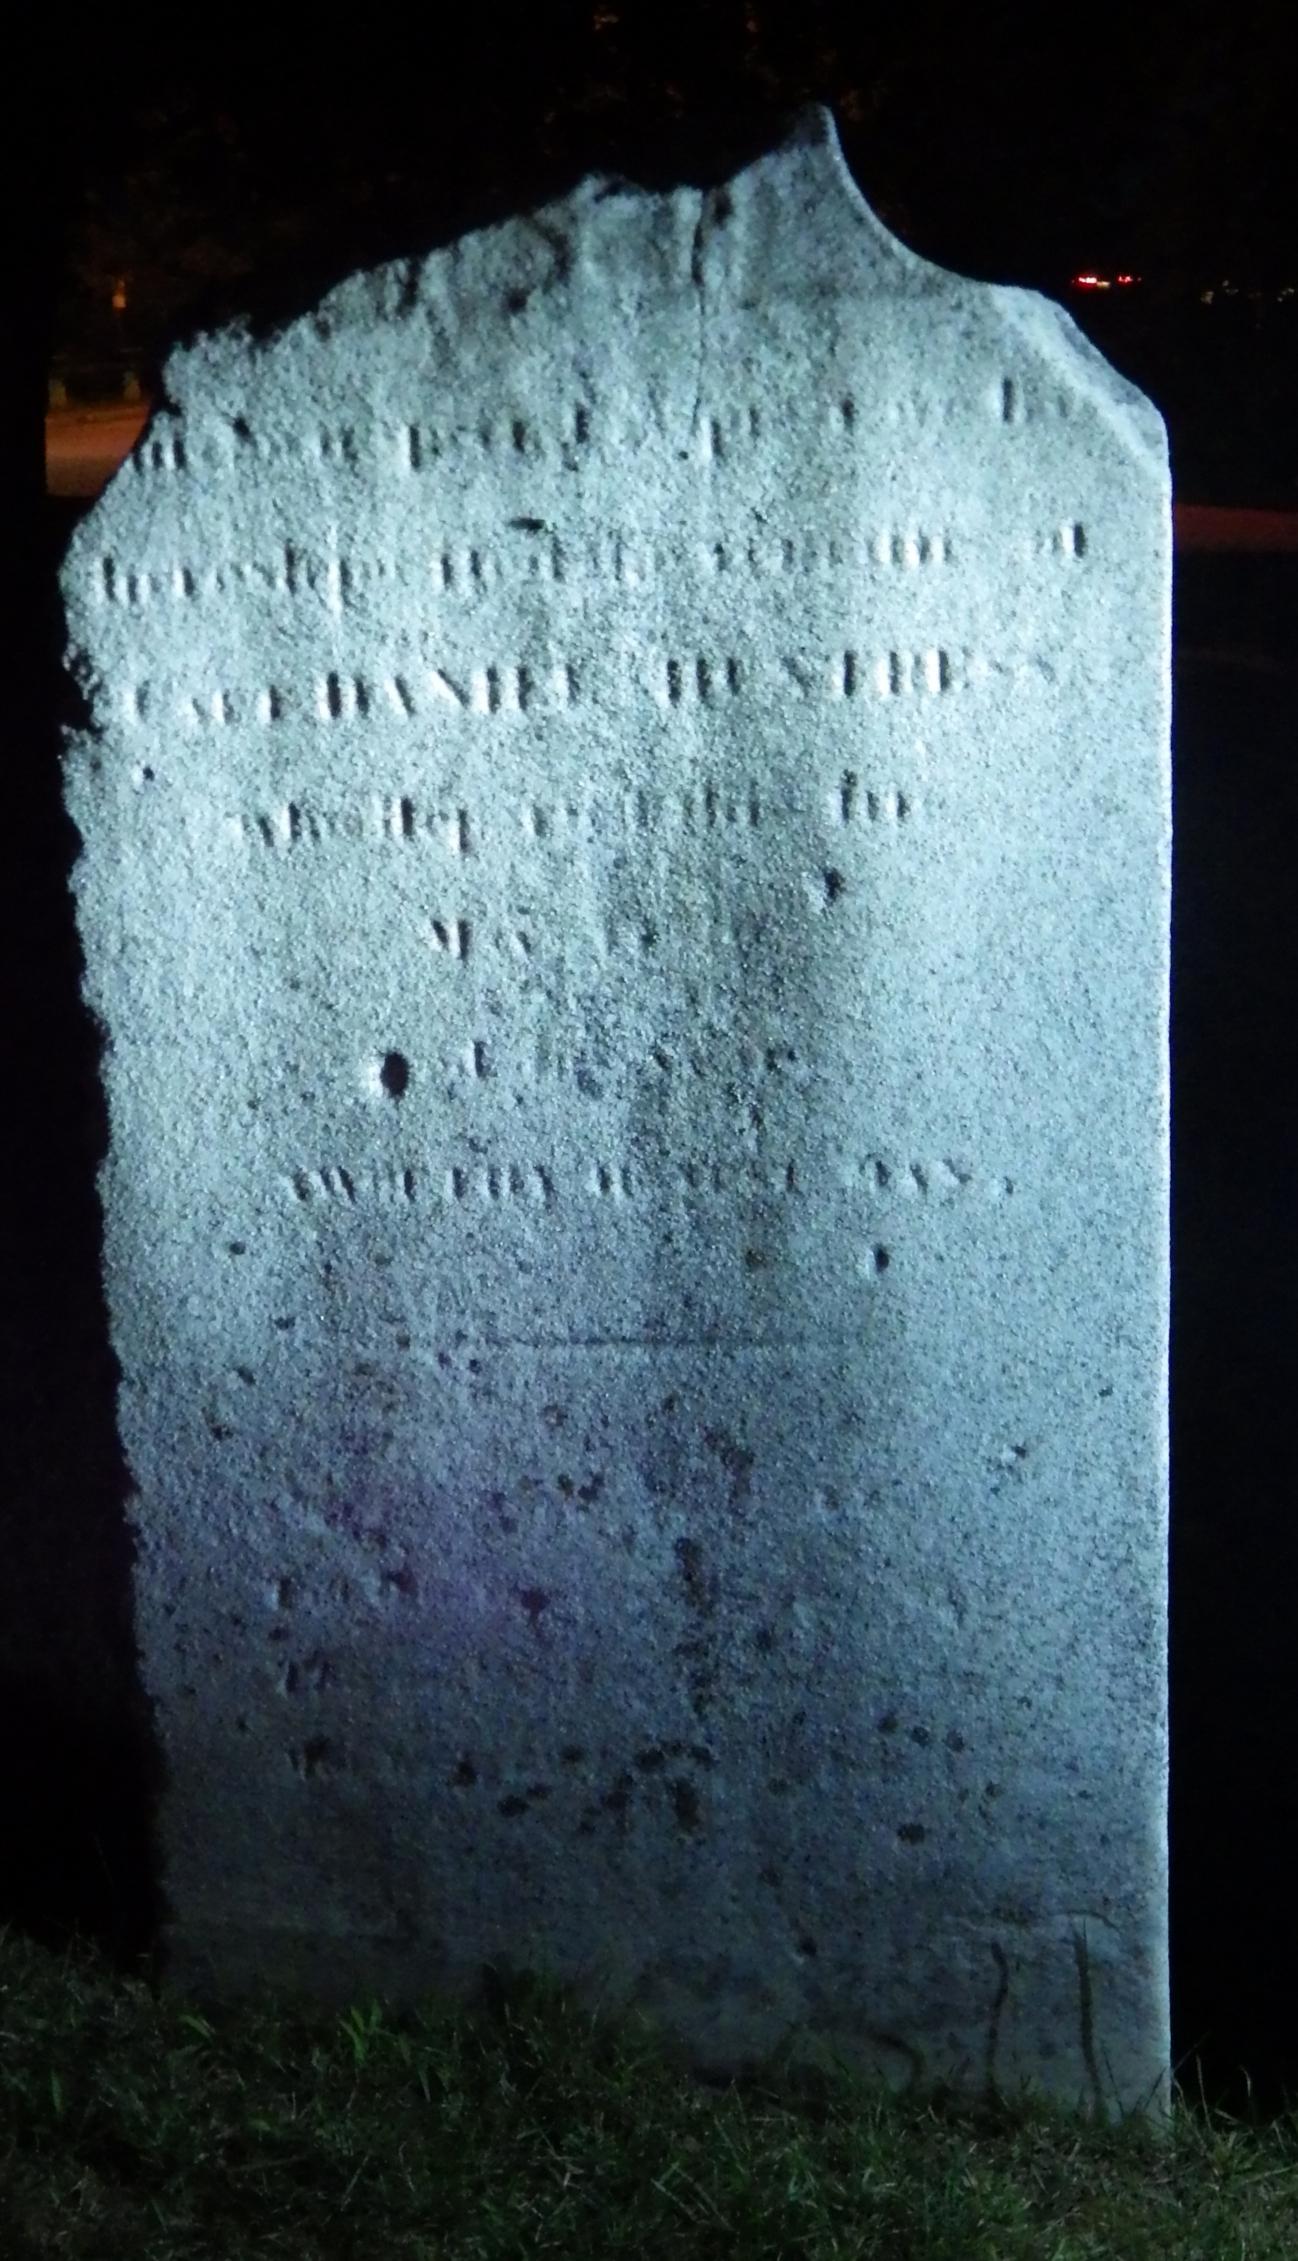 Daniel Huntress stone 1